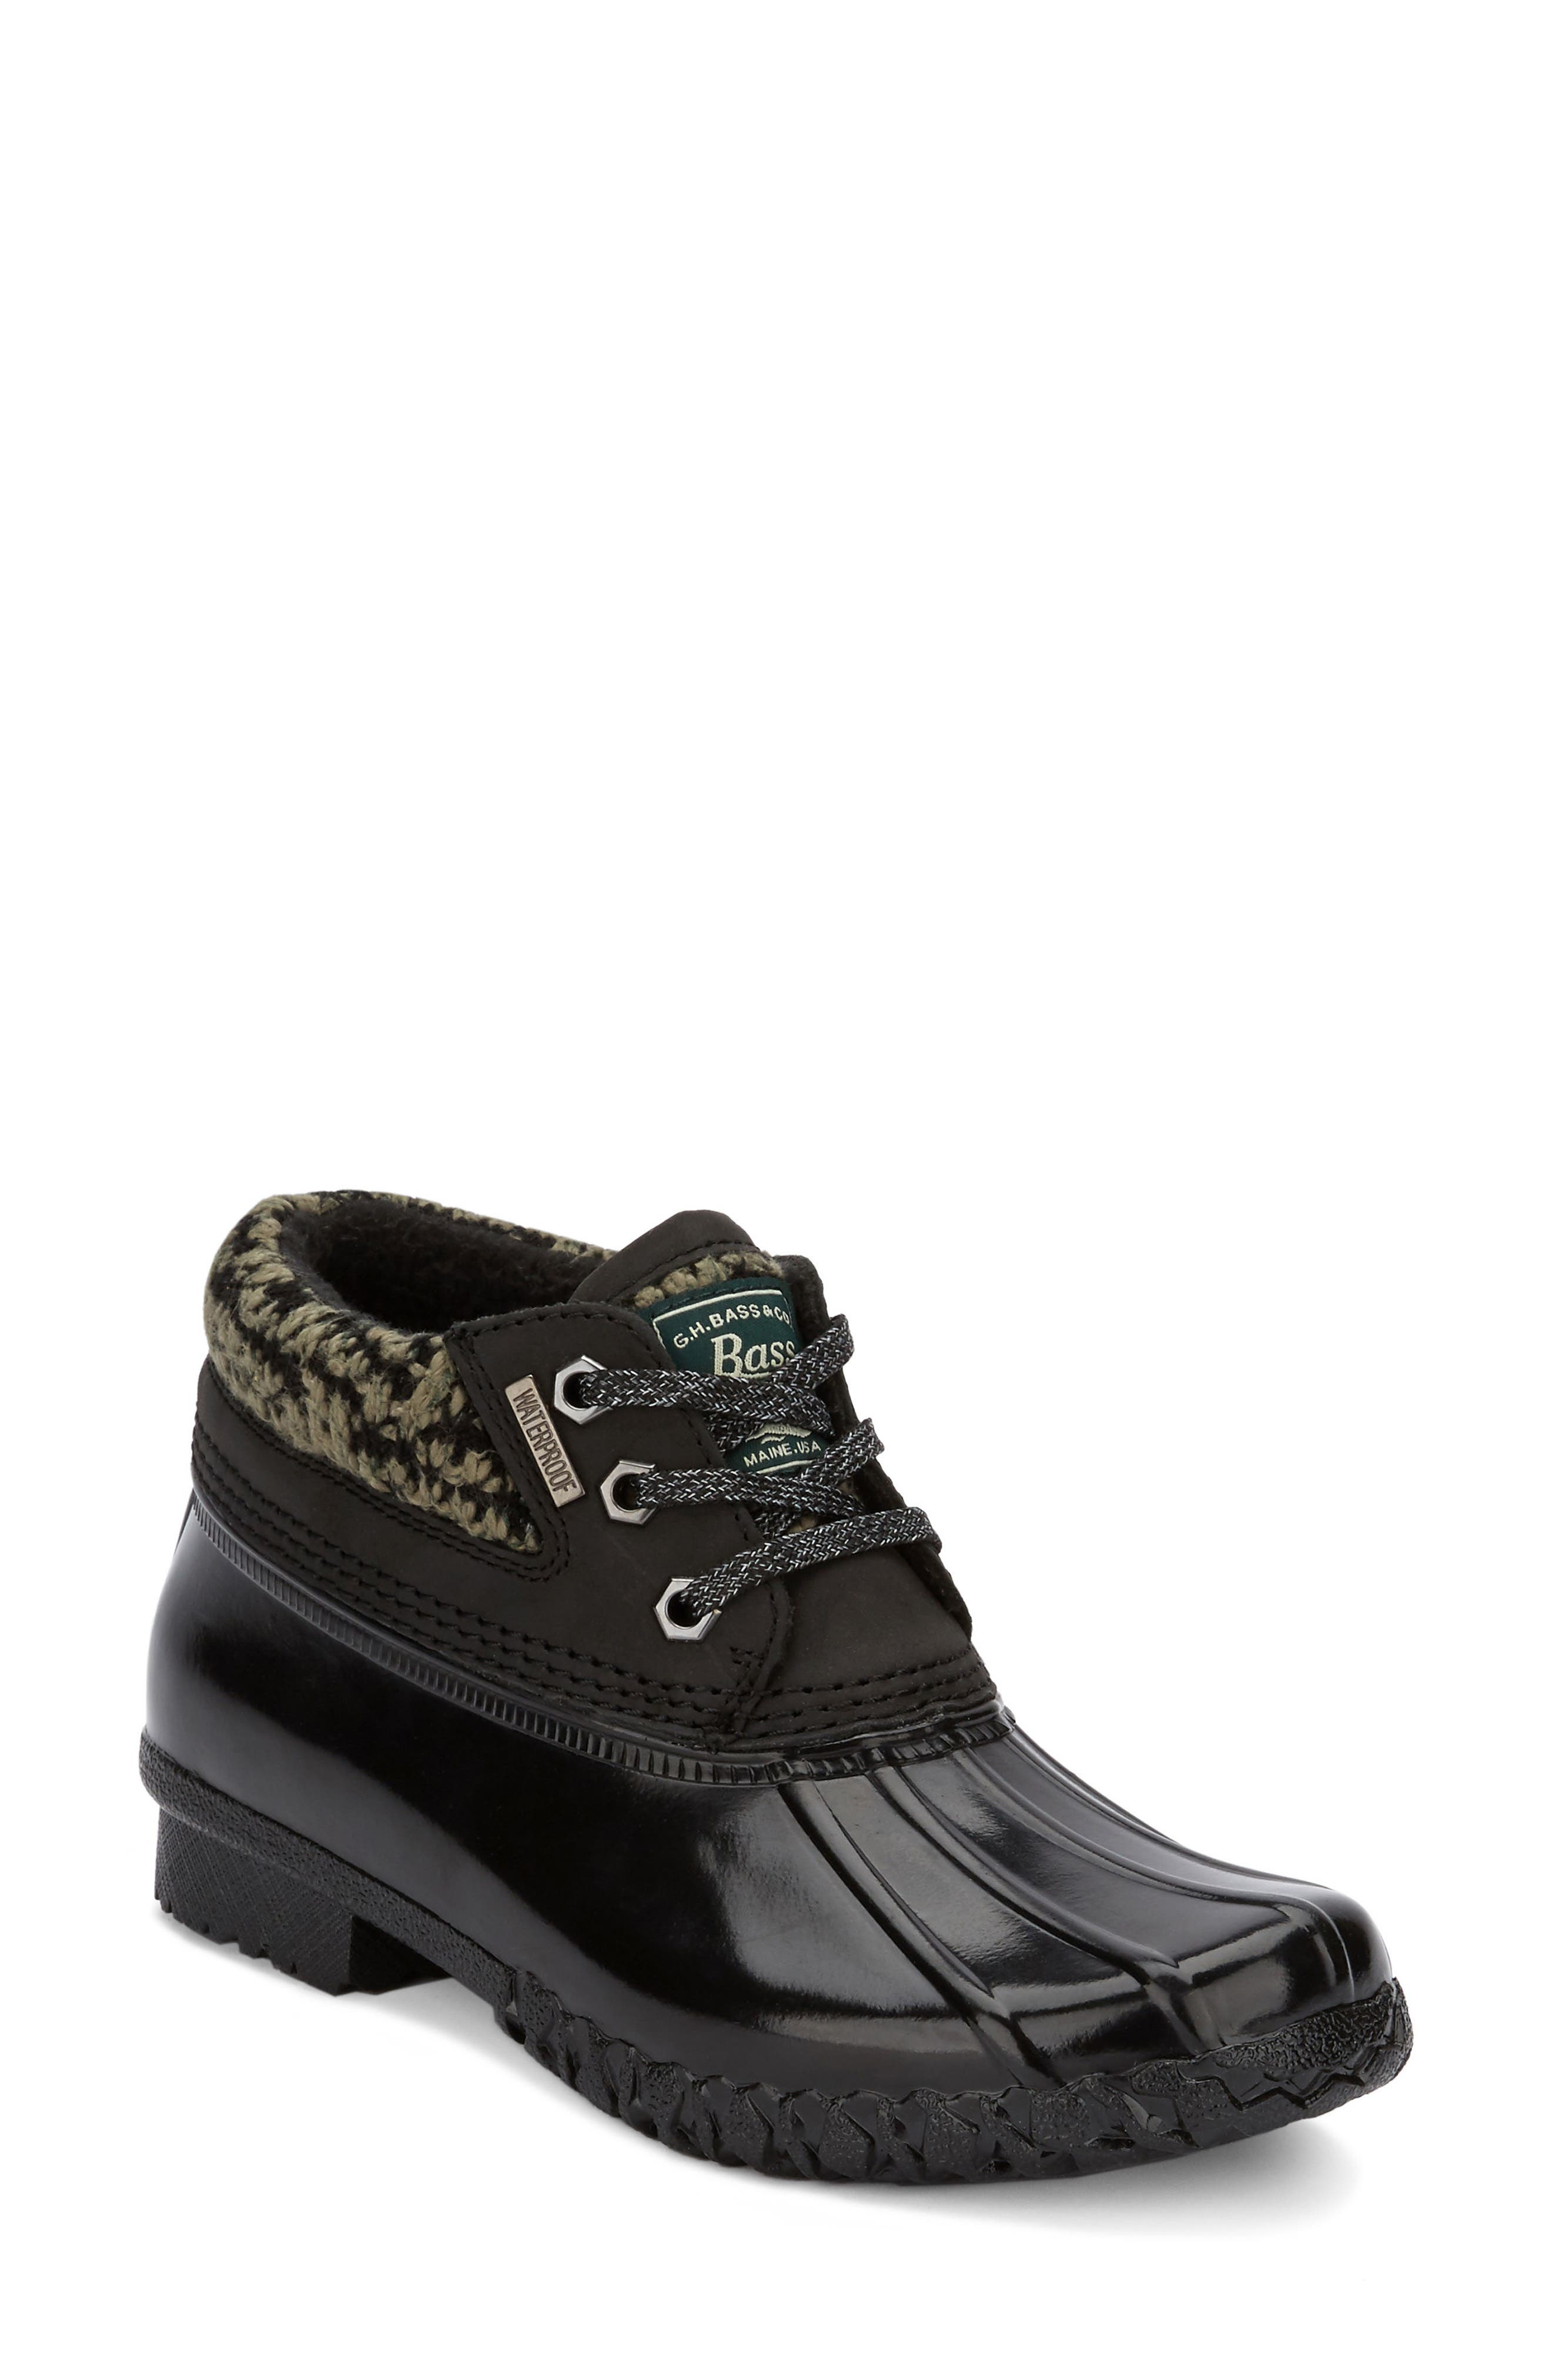 Dorothy Waterproof Duck Boot,                         Main,                         color, 003